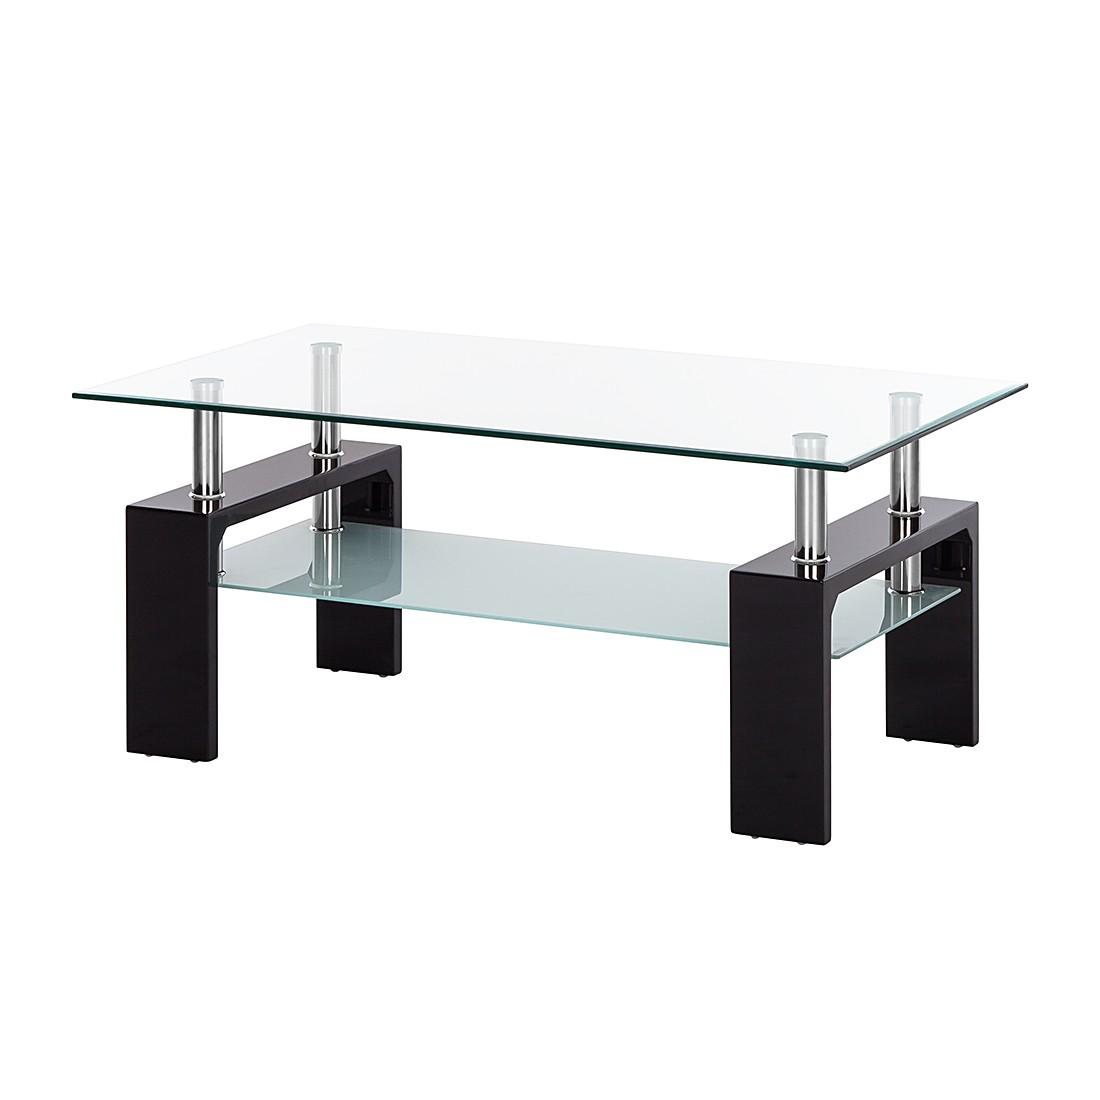 Table basse Glassy - Verre transparent / Noir, roomscape